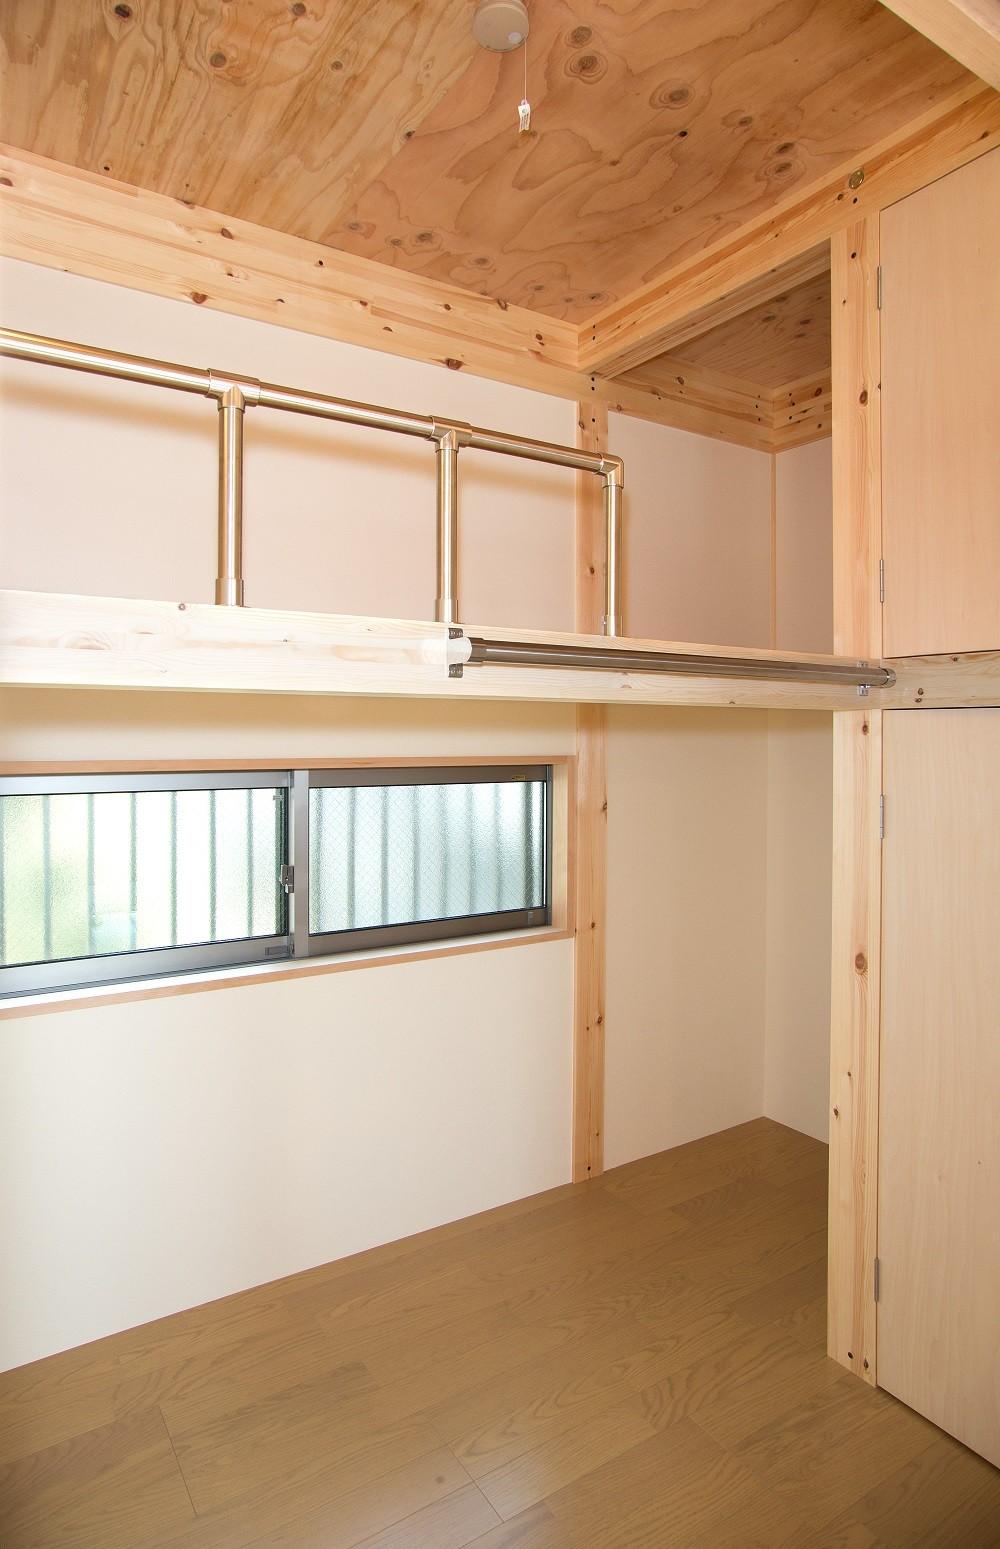 子供部屋事例:子供部屋(木造平屋建てバリアフリー住宅)